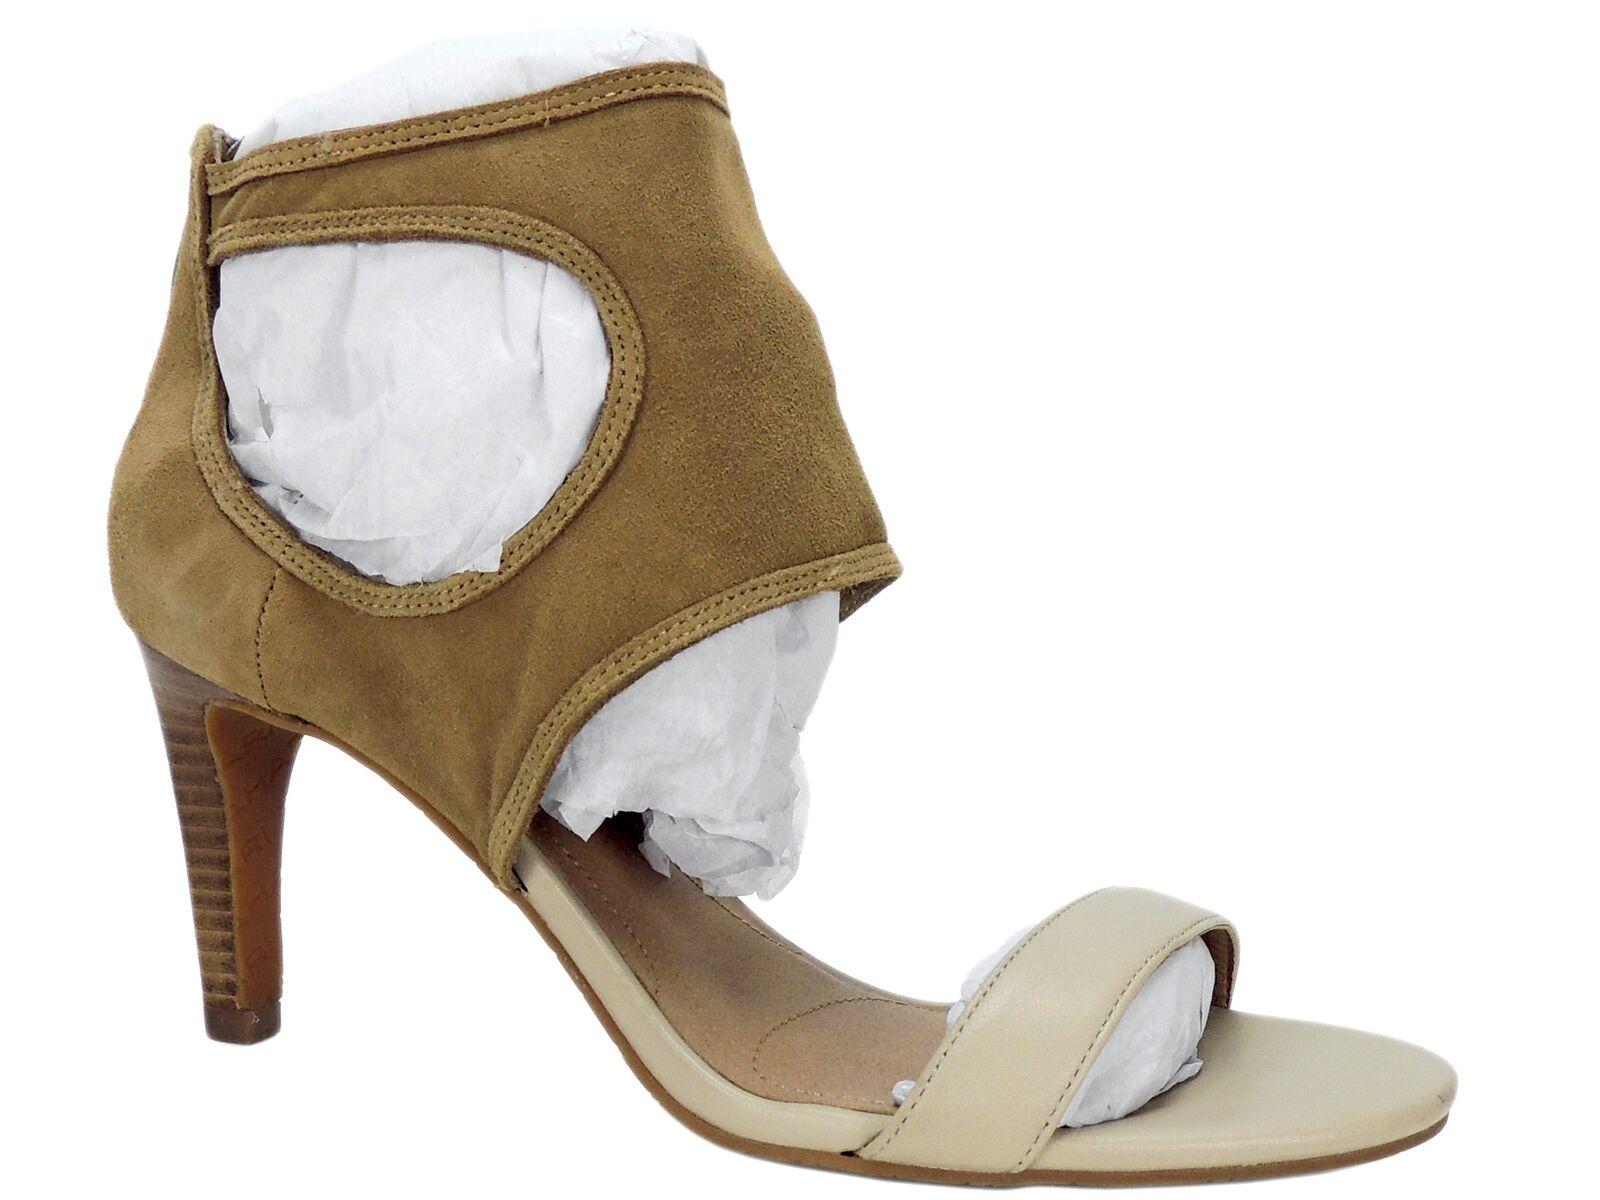 Tahari Women's National Dress Sandals Cream Fawn Leather Size 8.5 M